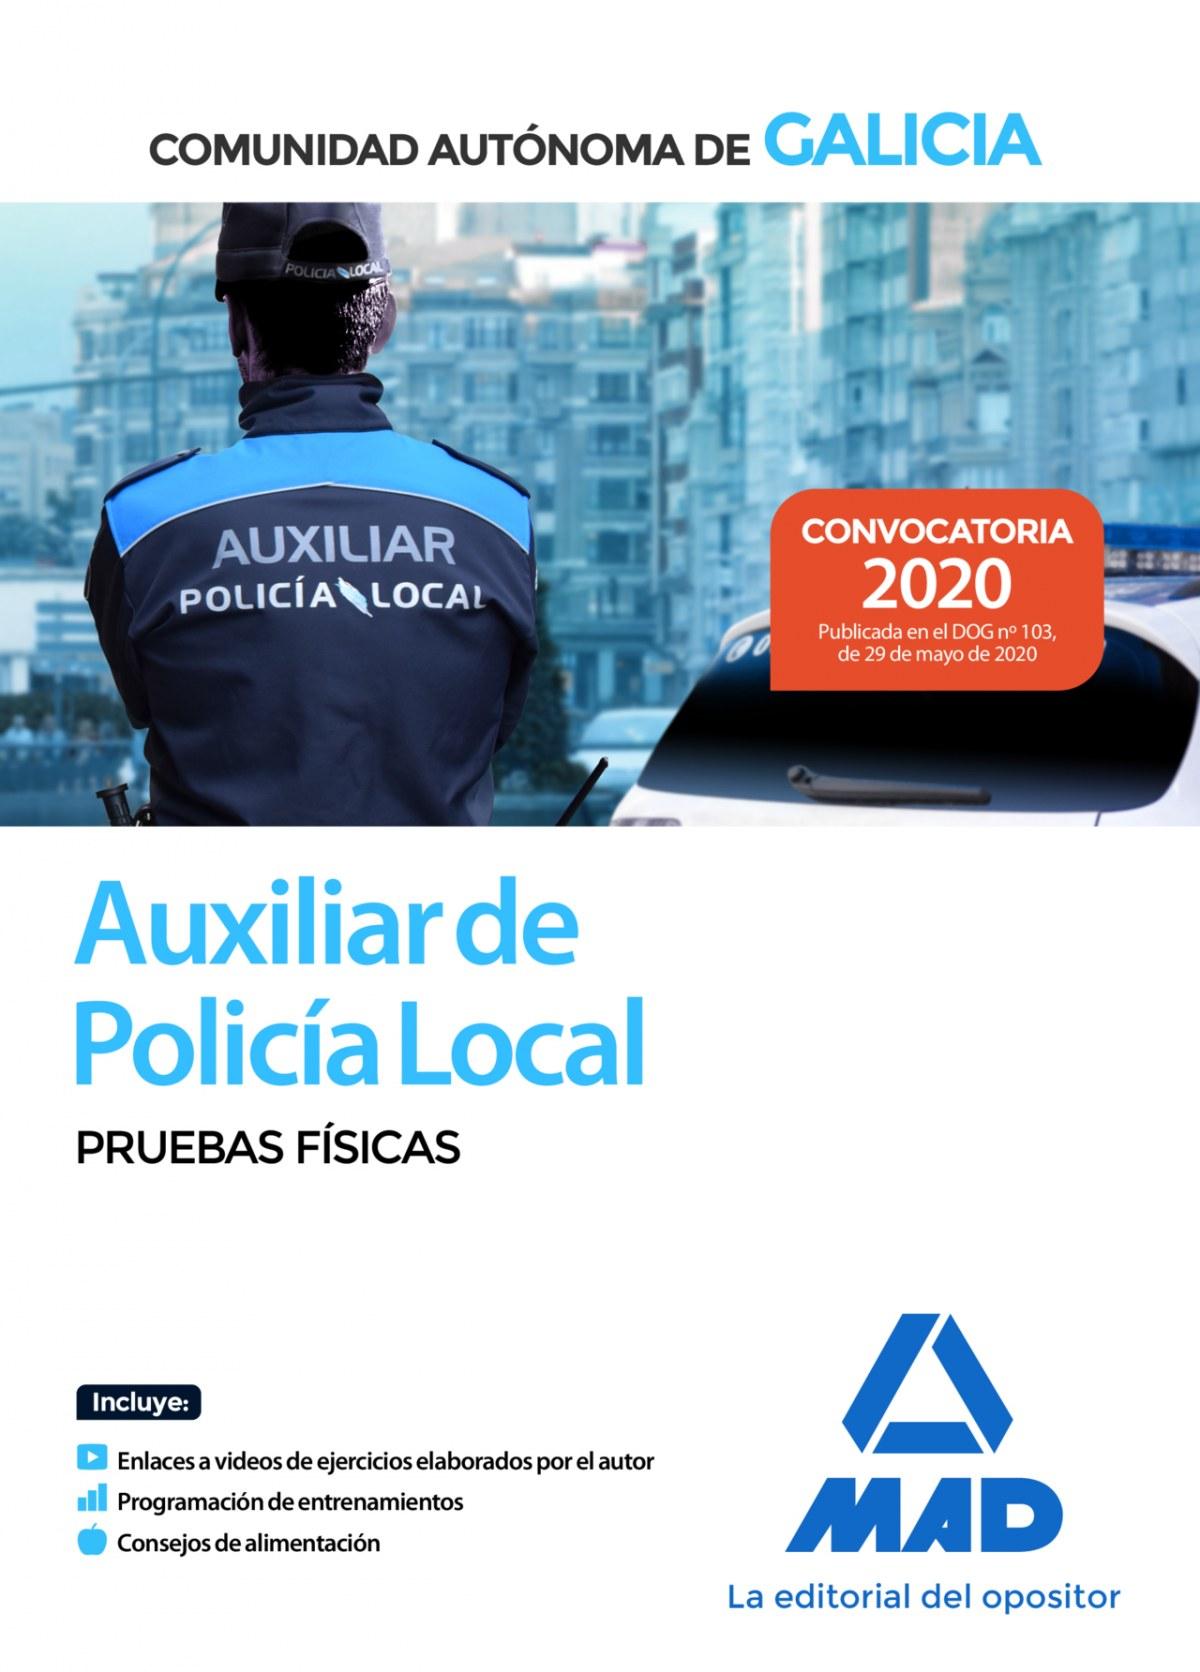 Auxiliar de Polic¡a Local de Galicia. Pruebas f¡sicas.